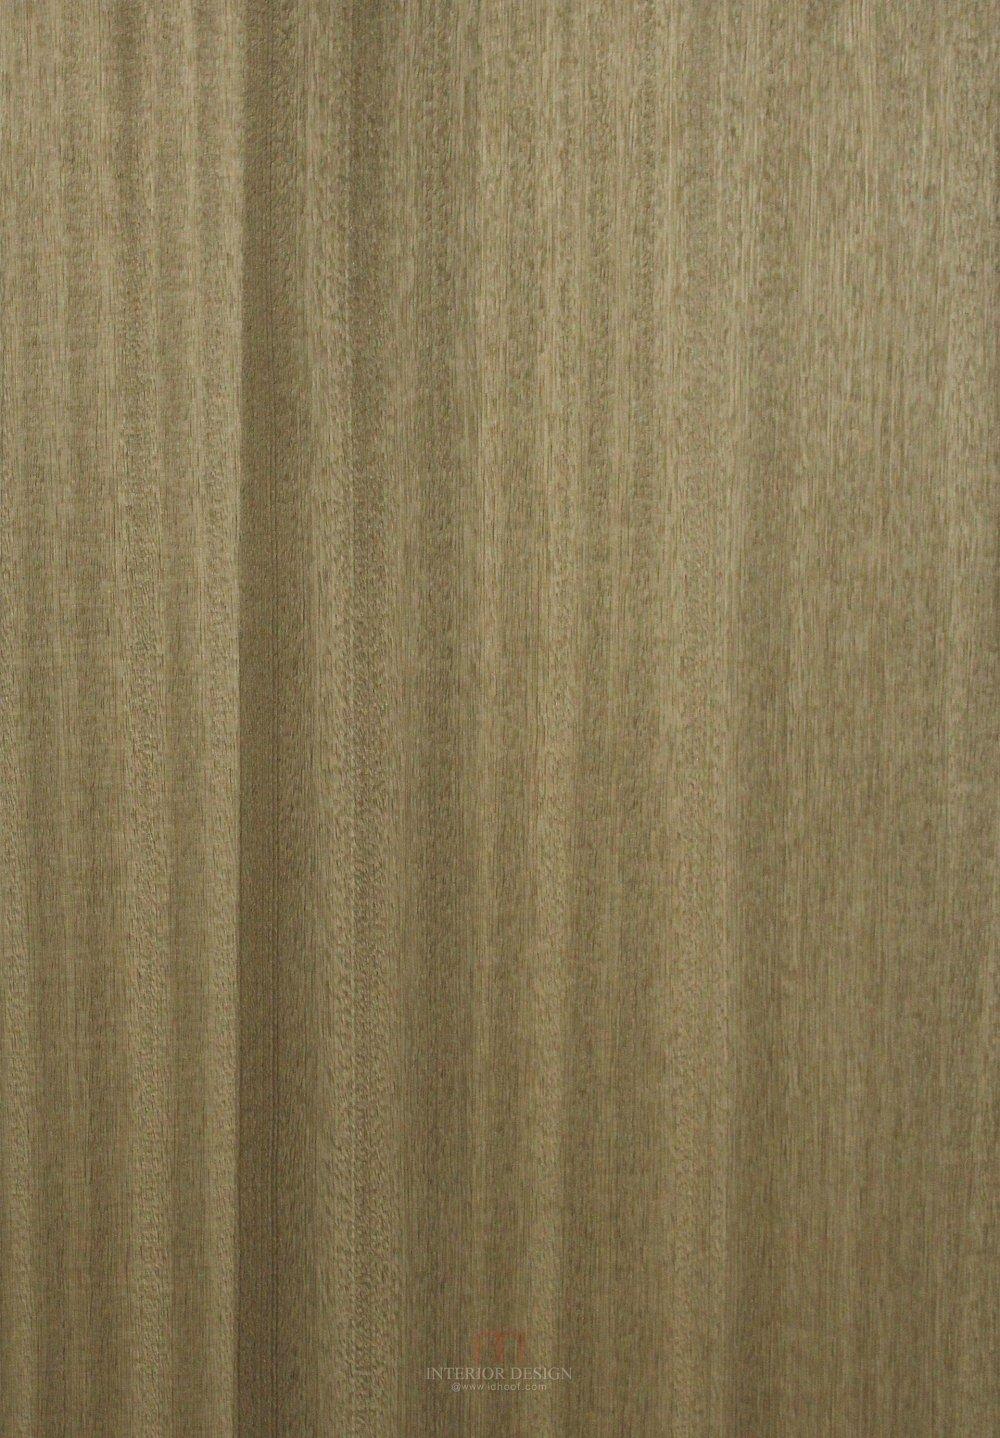 K6125PN_沙比利噴砂自然拼.jpg